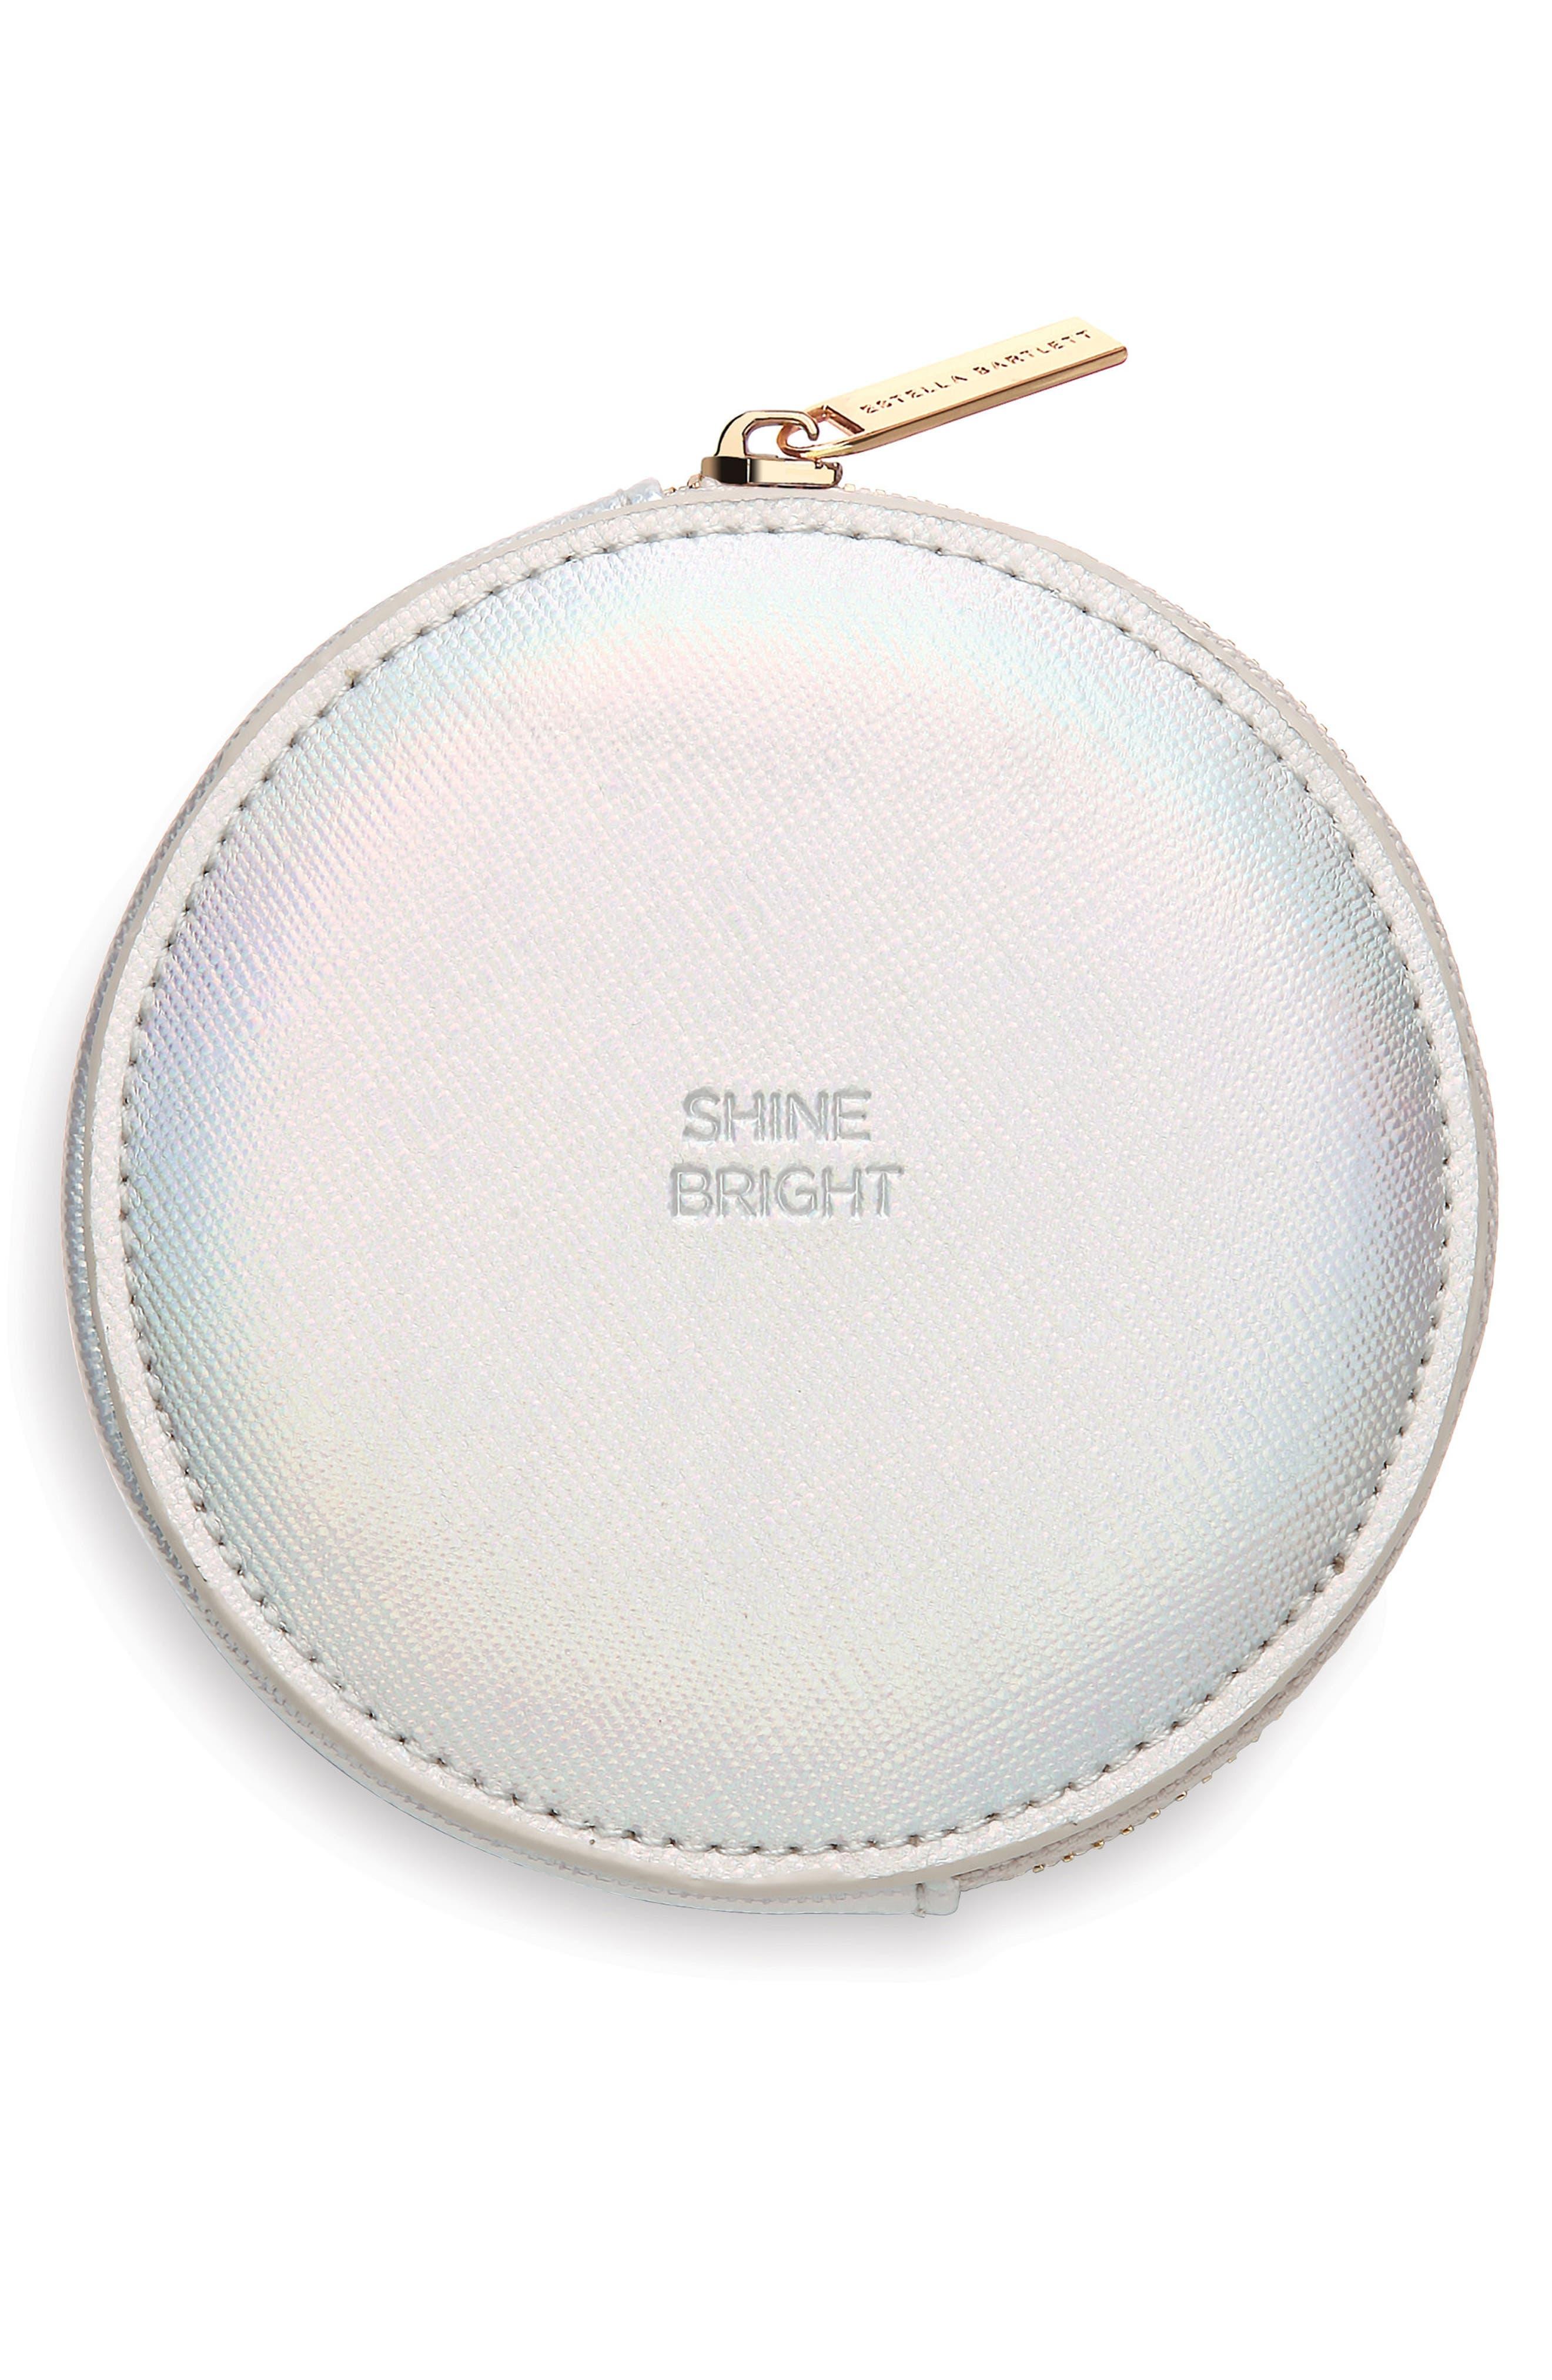 Shine Bright Faux Leather Pouch,                         Main,                         color, 040